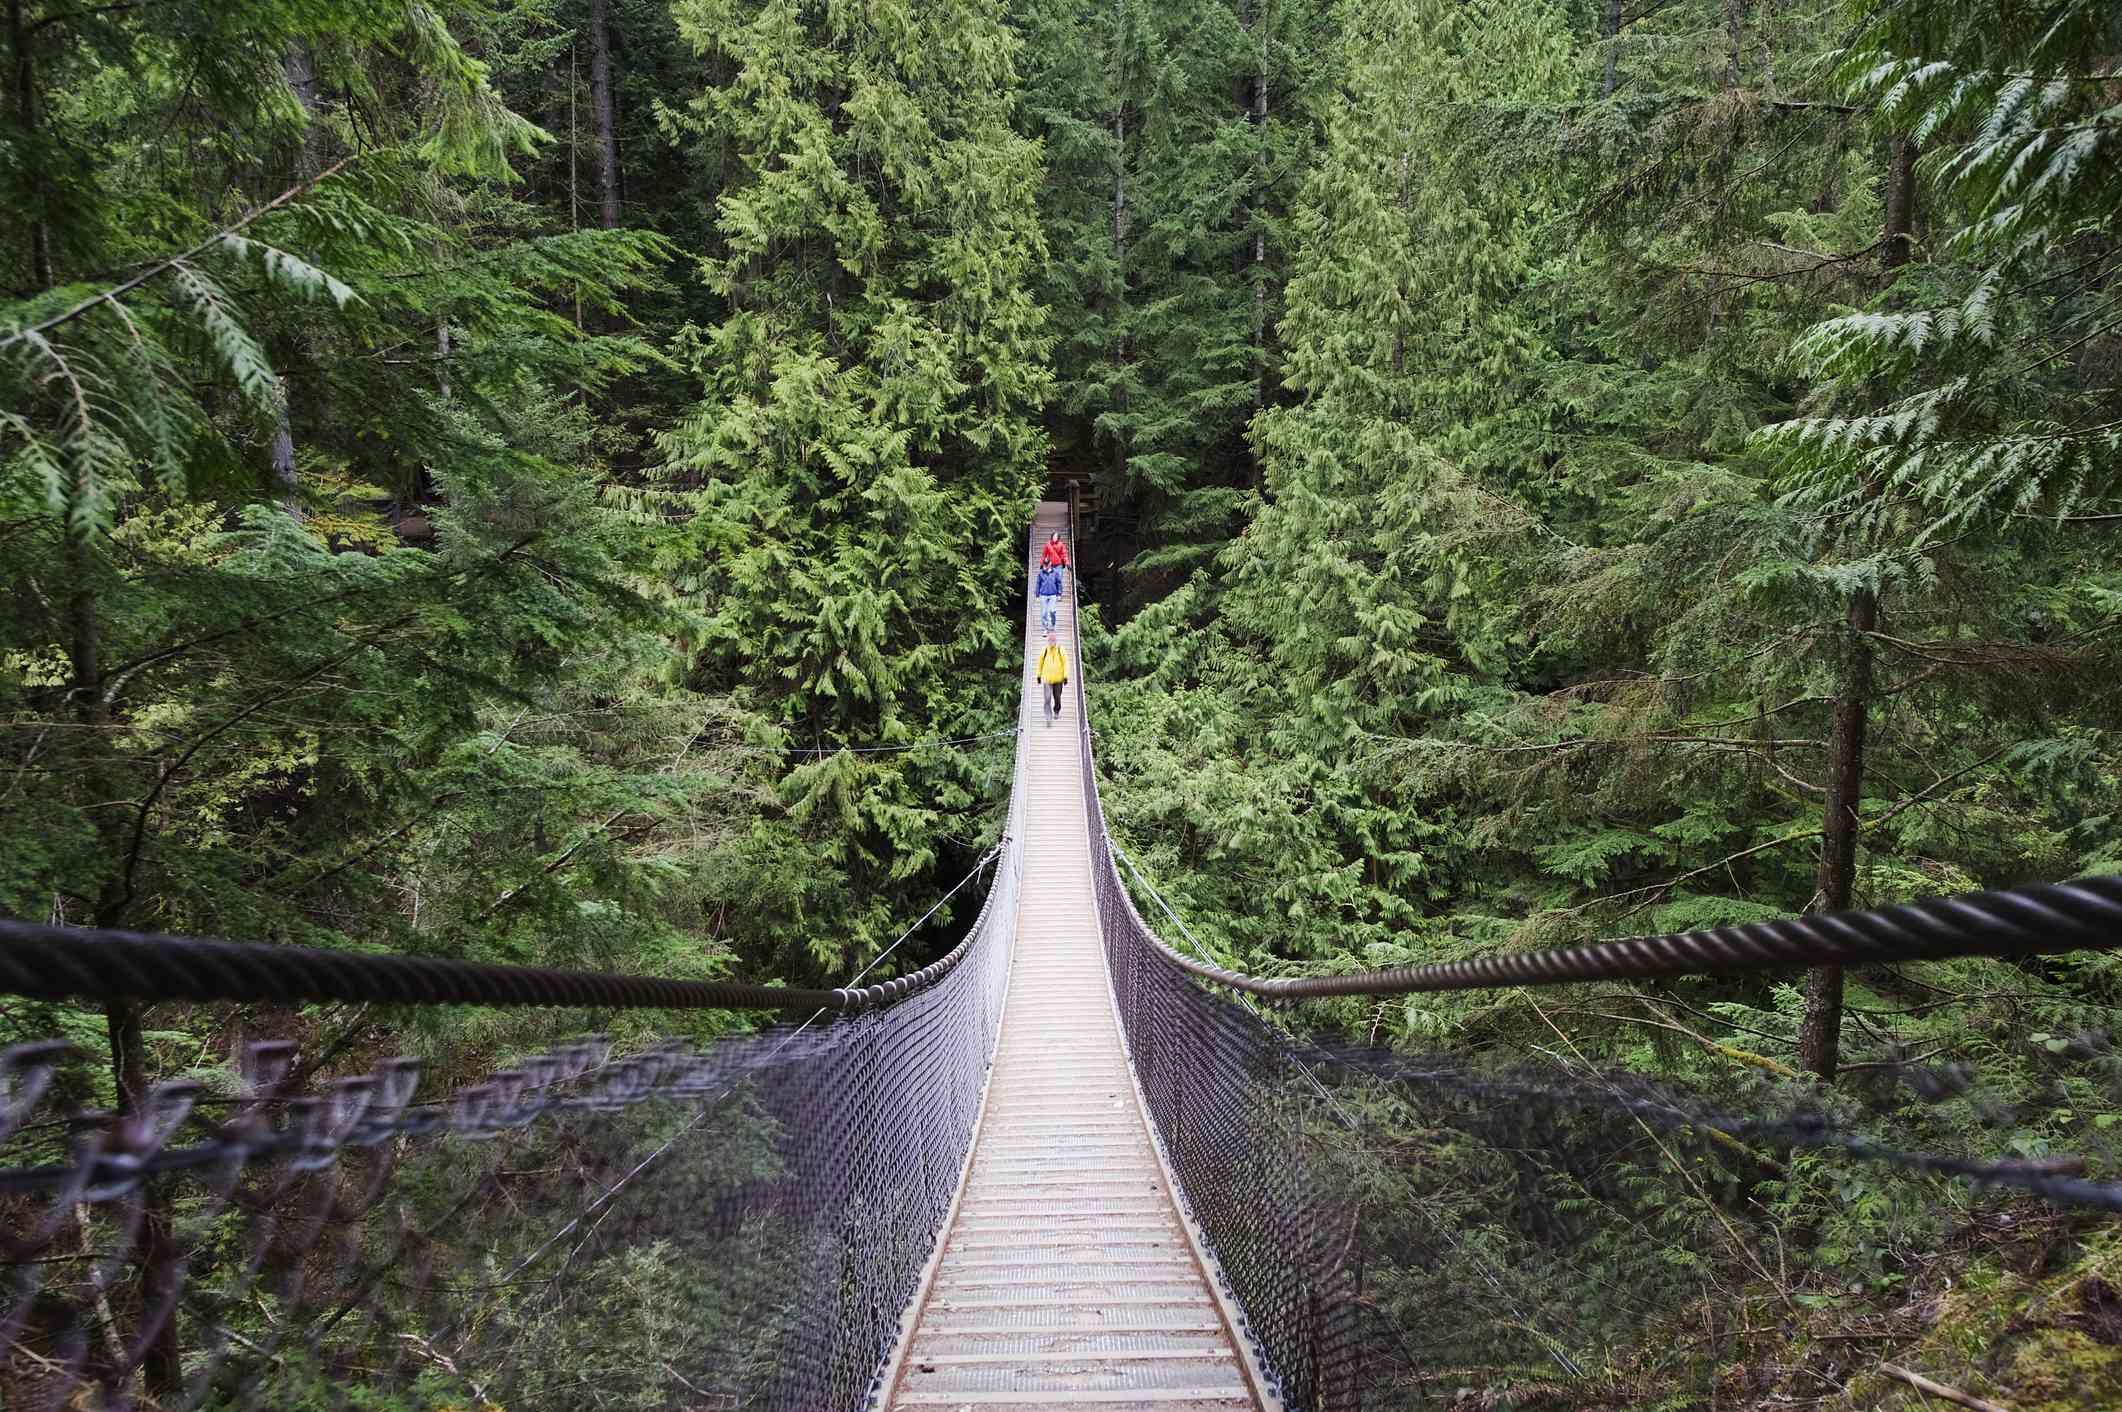 Suspension bridge at Lynn Canyon Park in Vancouver